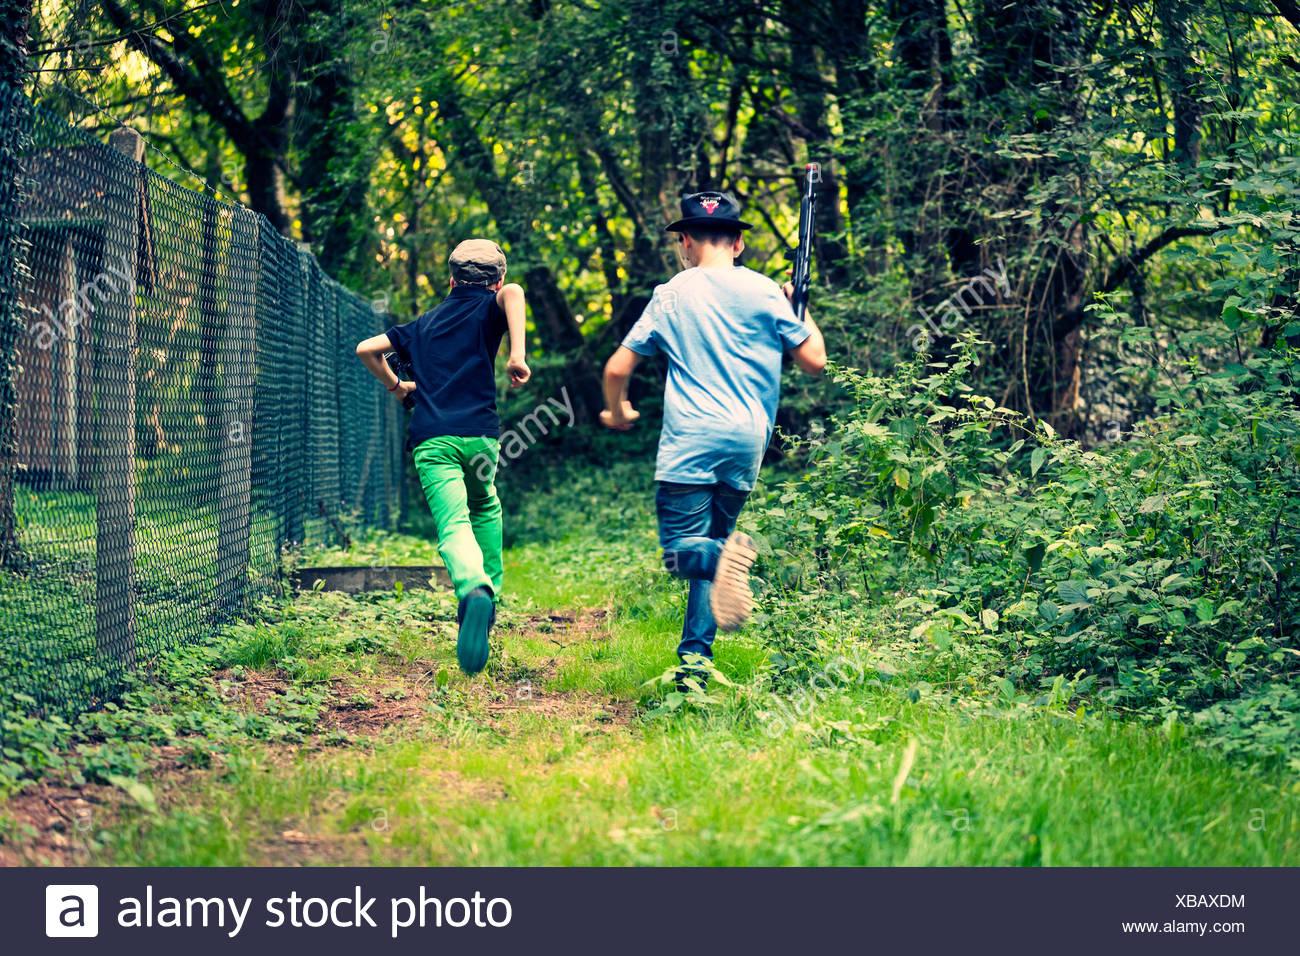 Dos muchachos huyendo, vista posterior Imagen De Stock